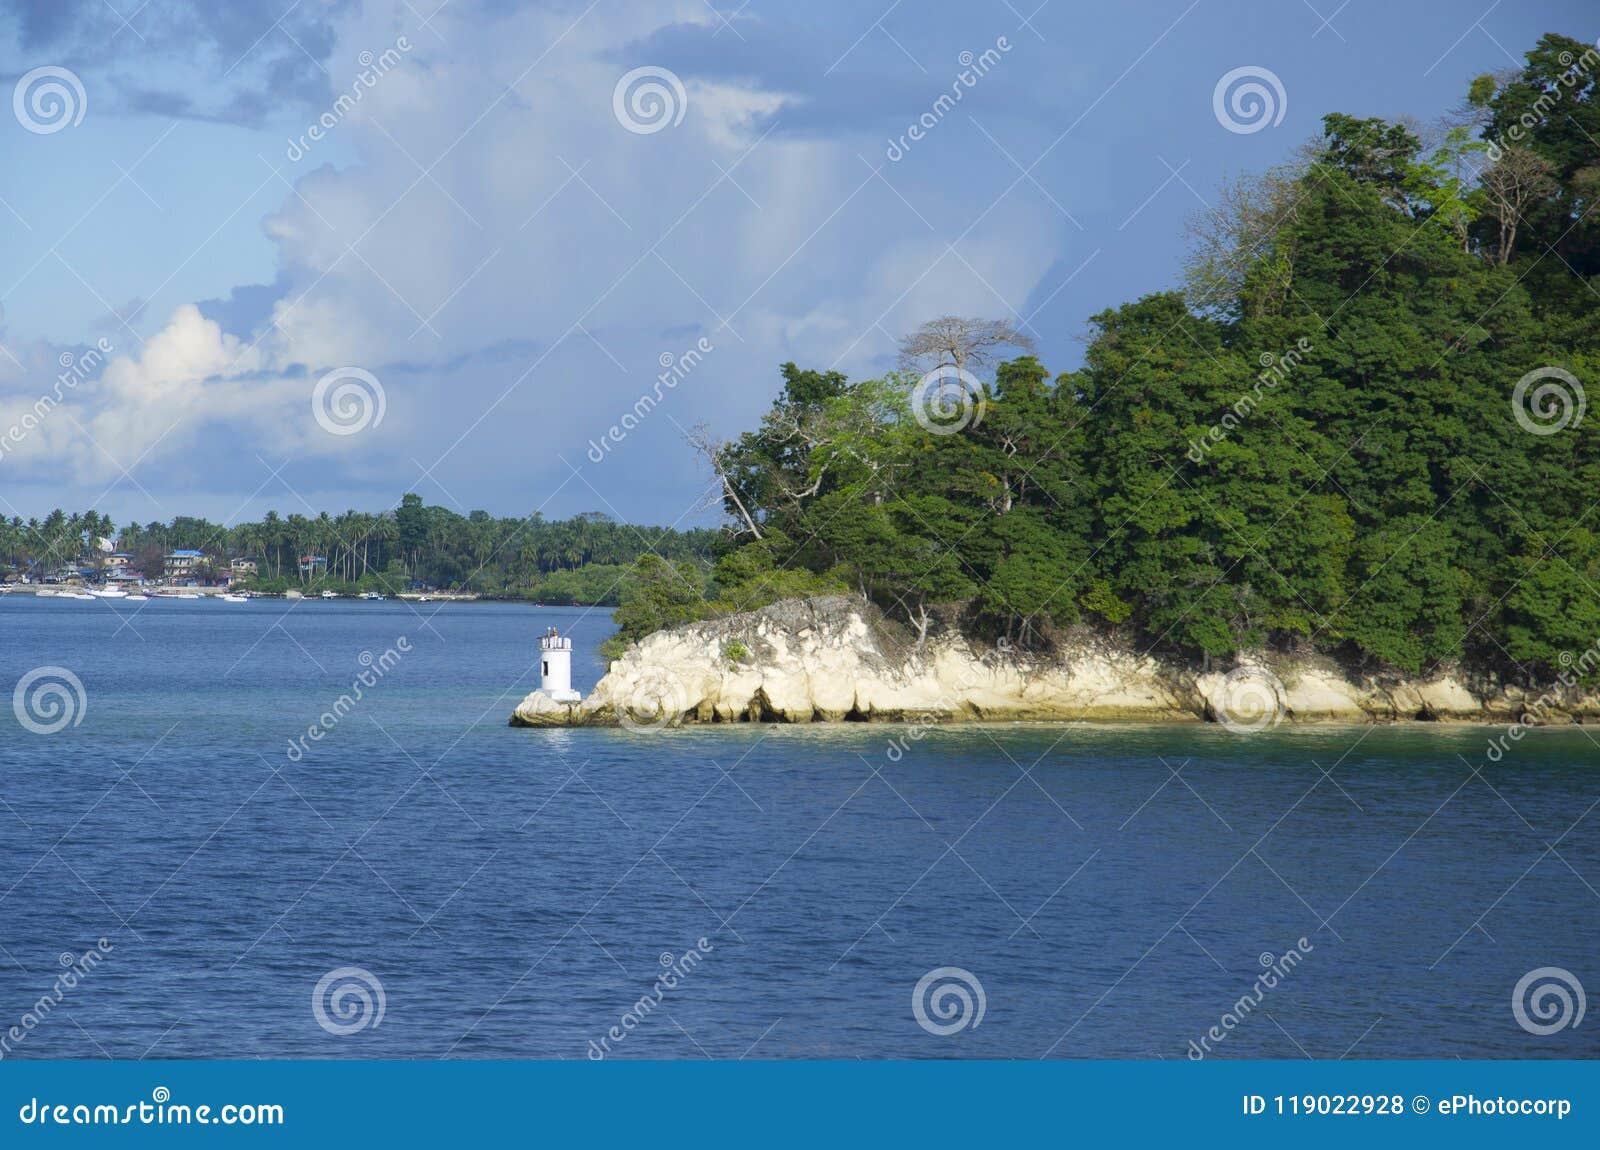 The light house of Havelock Island, Port Blair, Andaman and Nicobar Islands